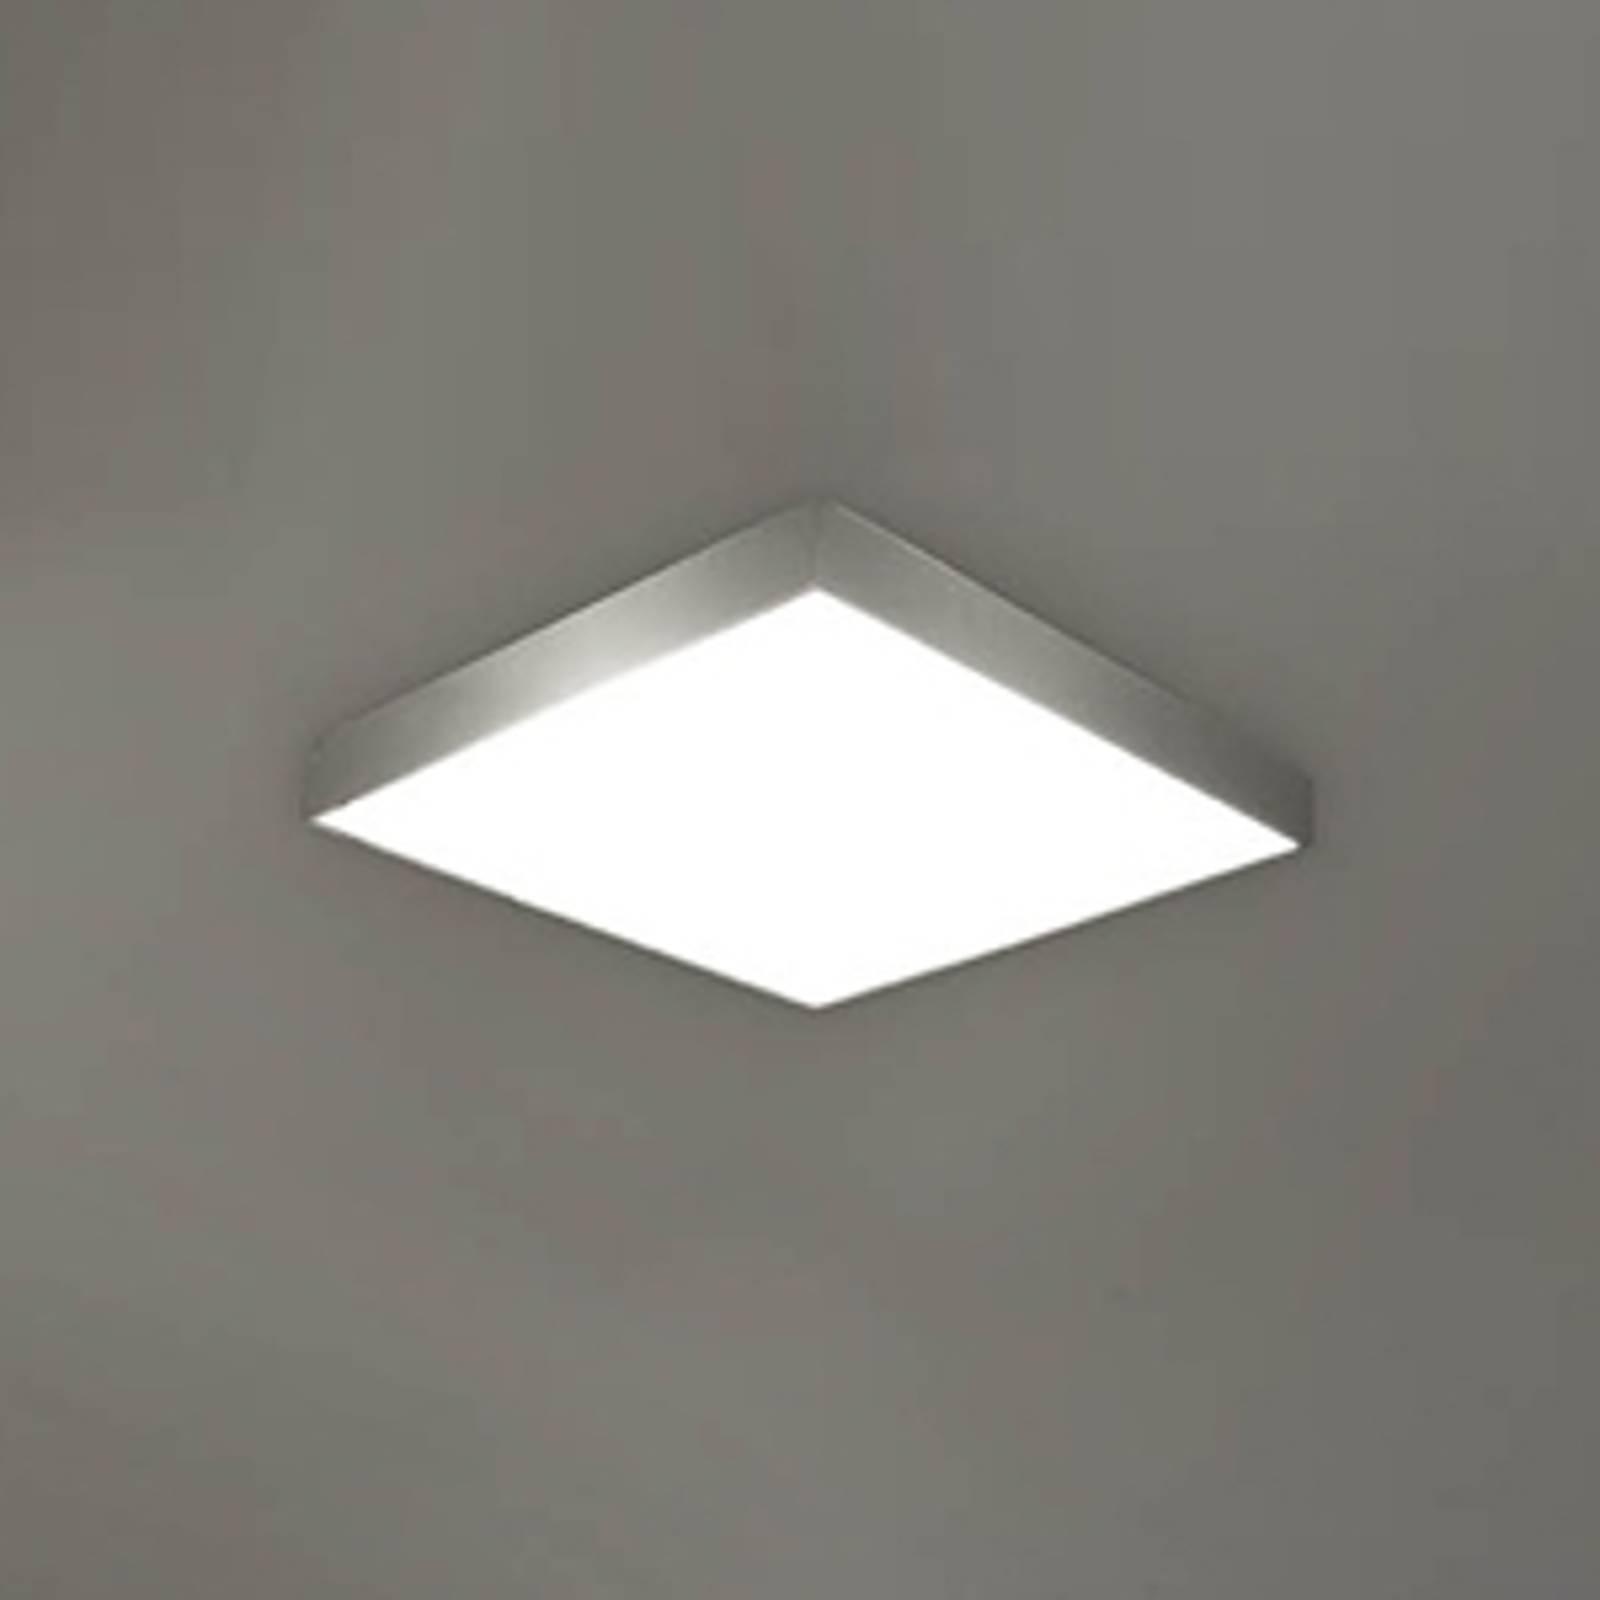 APOLO – łazienkowa lampa sufitowa, IP44, nikl.